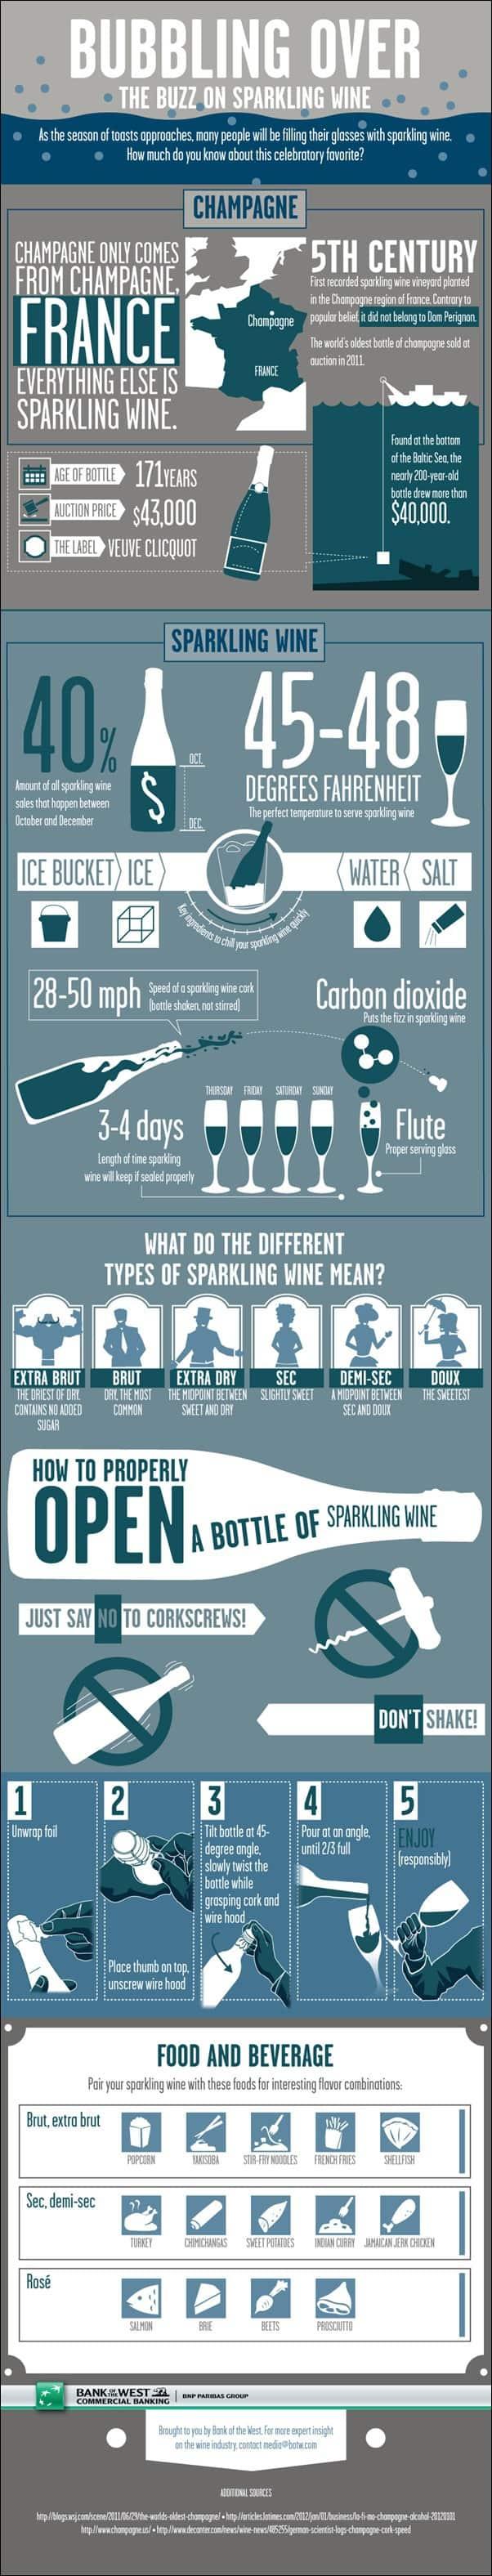 Wine-ing Wednesday – Sparkling Wine!